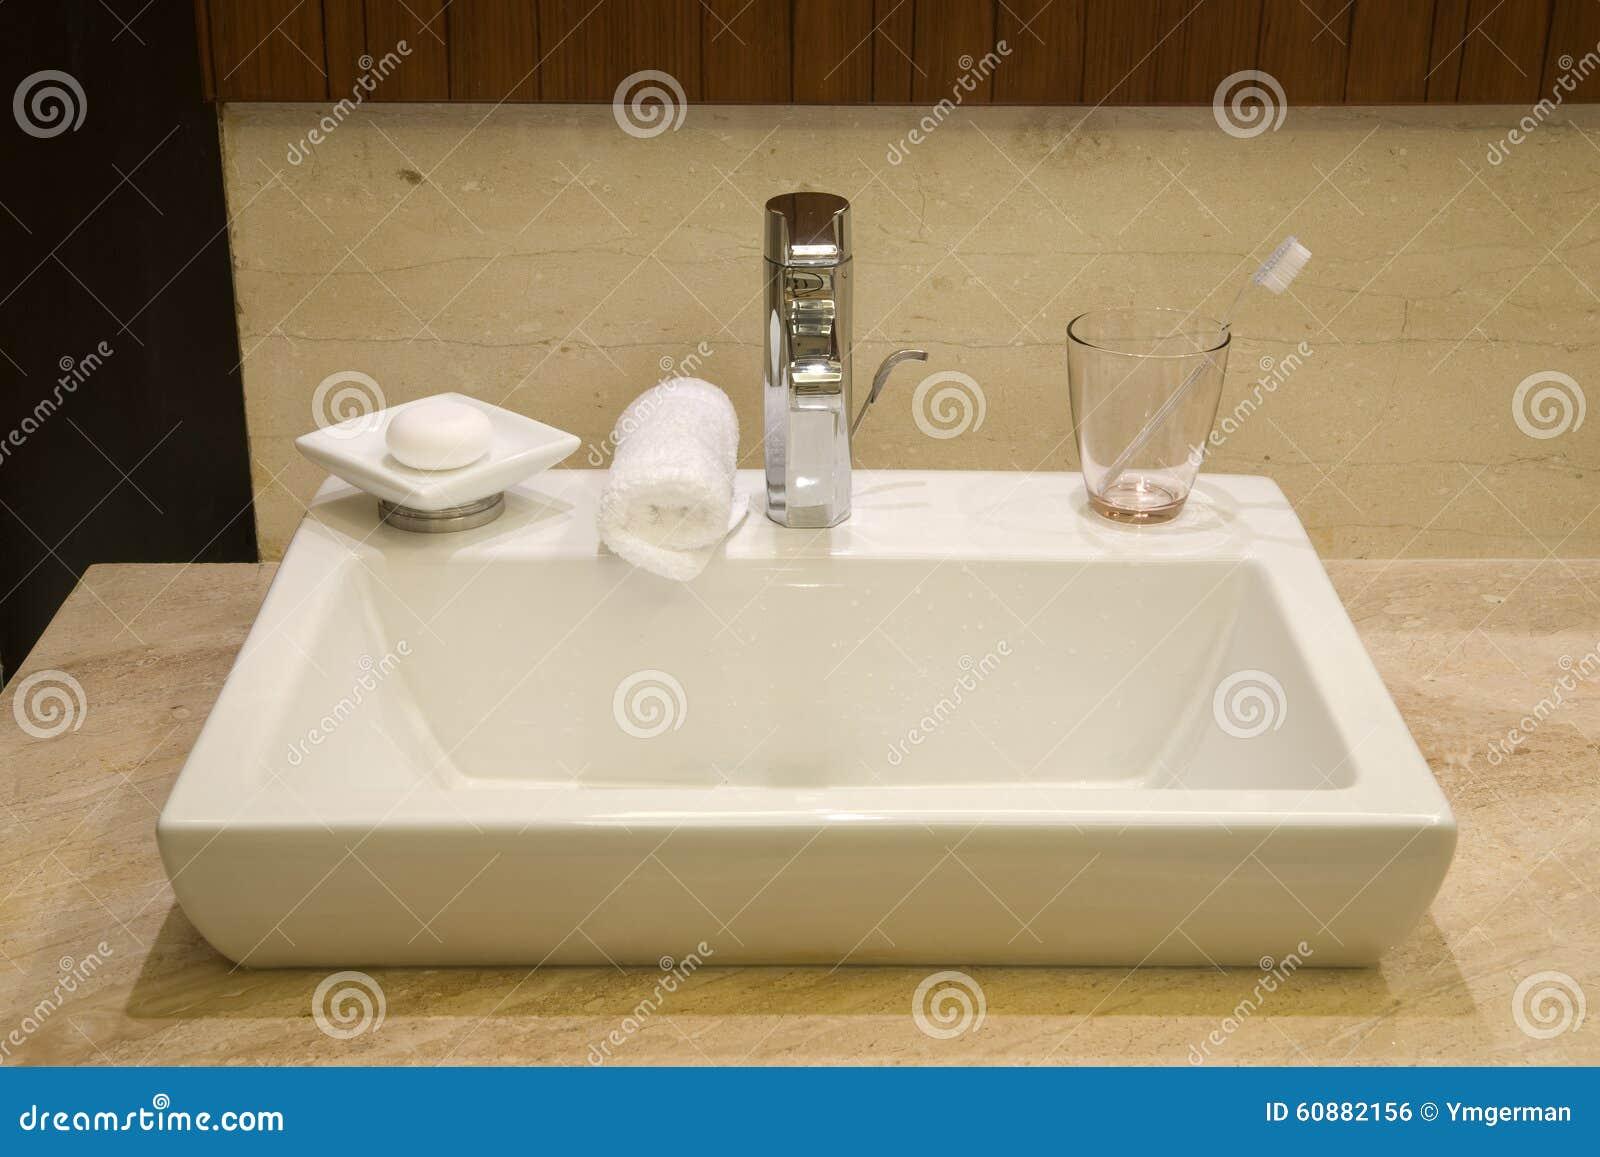 Luxury Hotel Bathroom Stock Photo Image Of Hotel Elegance 60882156